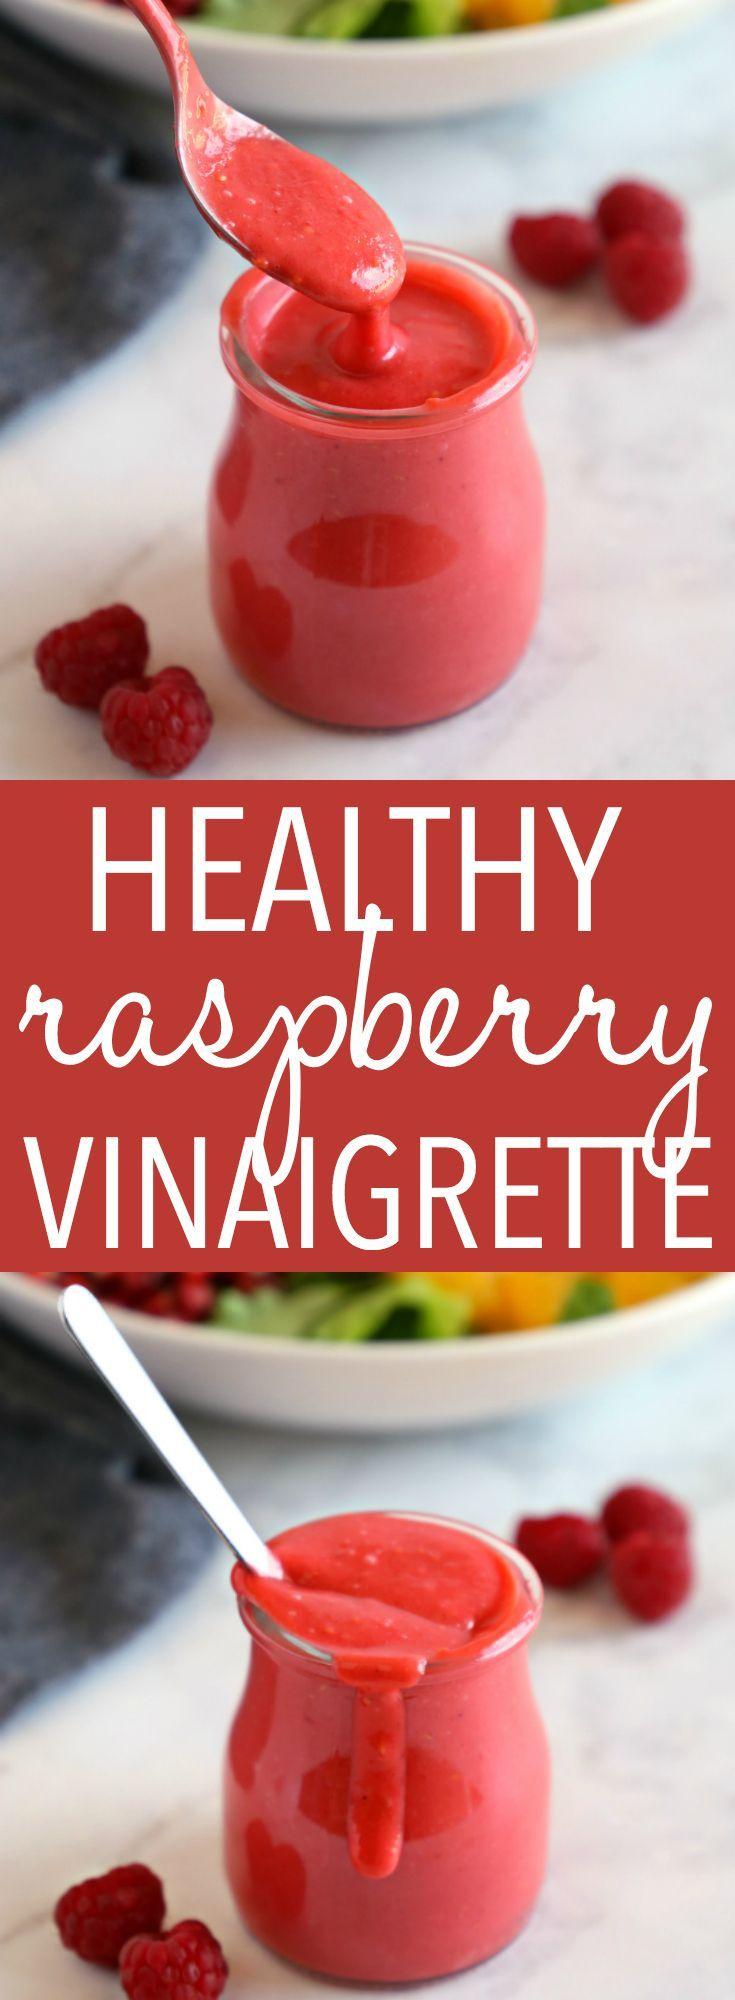 Healthy Raspberry Vinaigrette Salad Dressing Recipe Raspberry Vinaigrette Salad Dressing Raspberry Vinaigrette Raspberry Salad Dressing [ 2000 x 735 Pixel ]